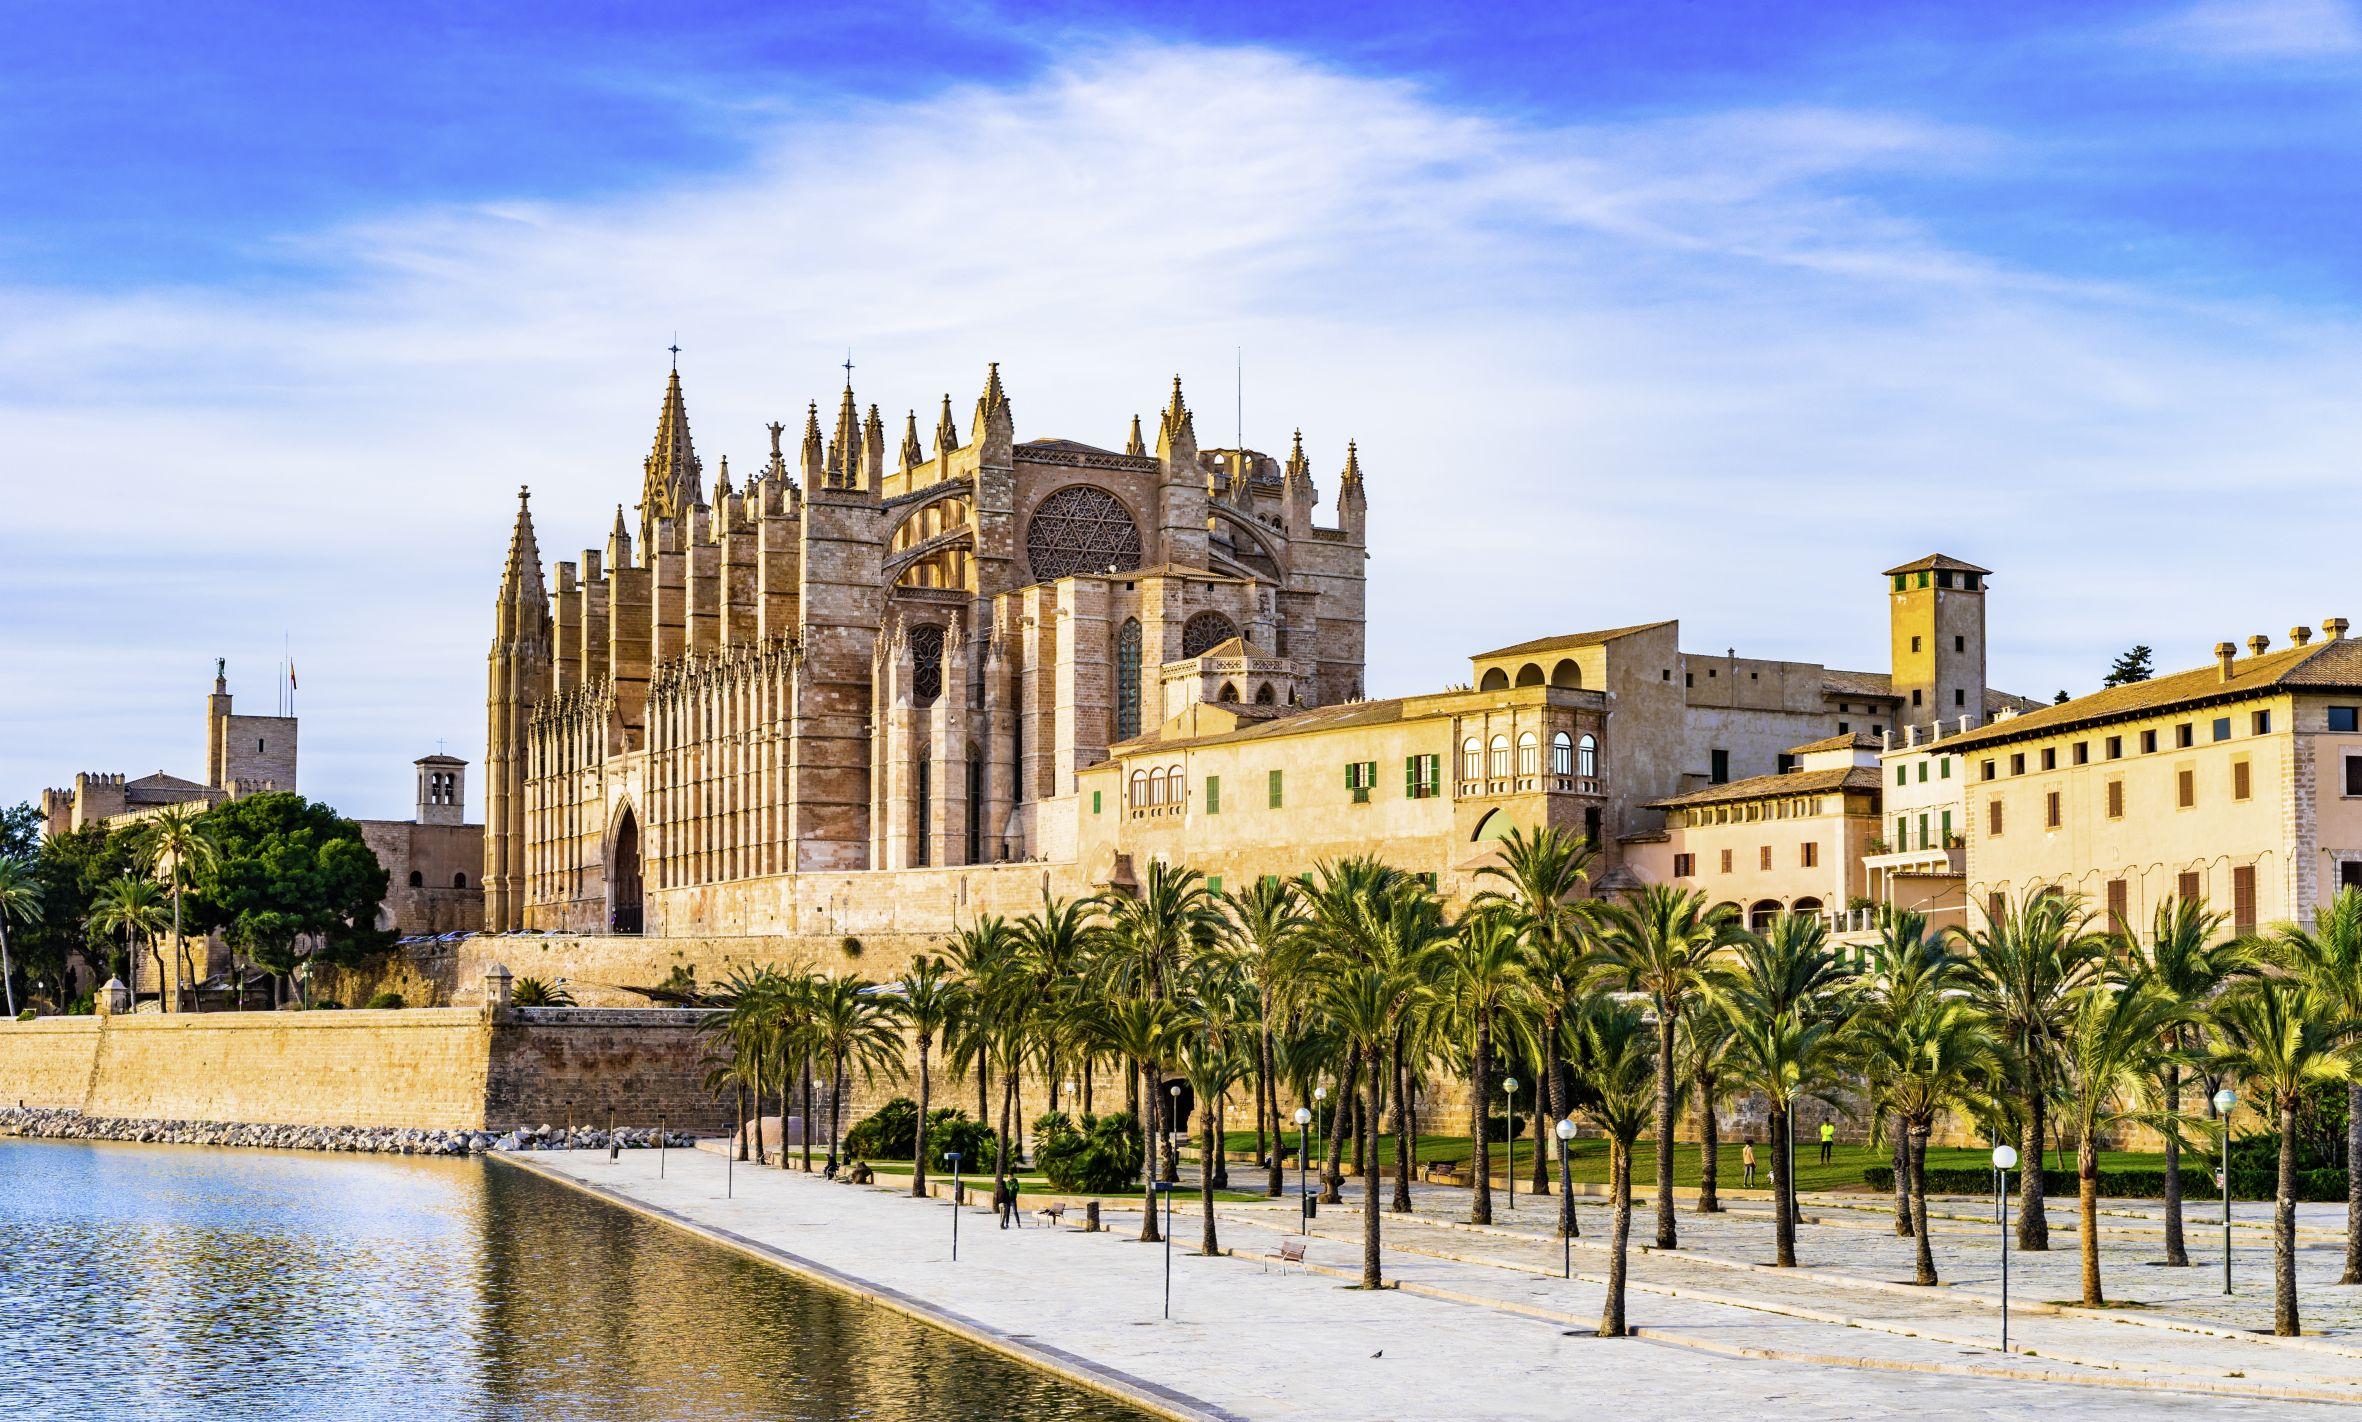 Spanien gutschein, Mallorca cashback, Mallorca gutschein, Mallorca rabatt, fti aktion